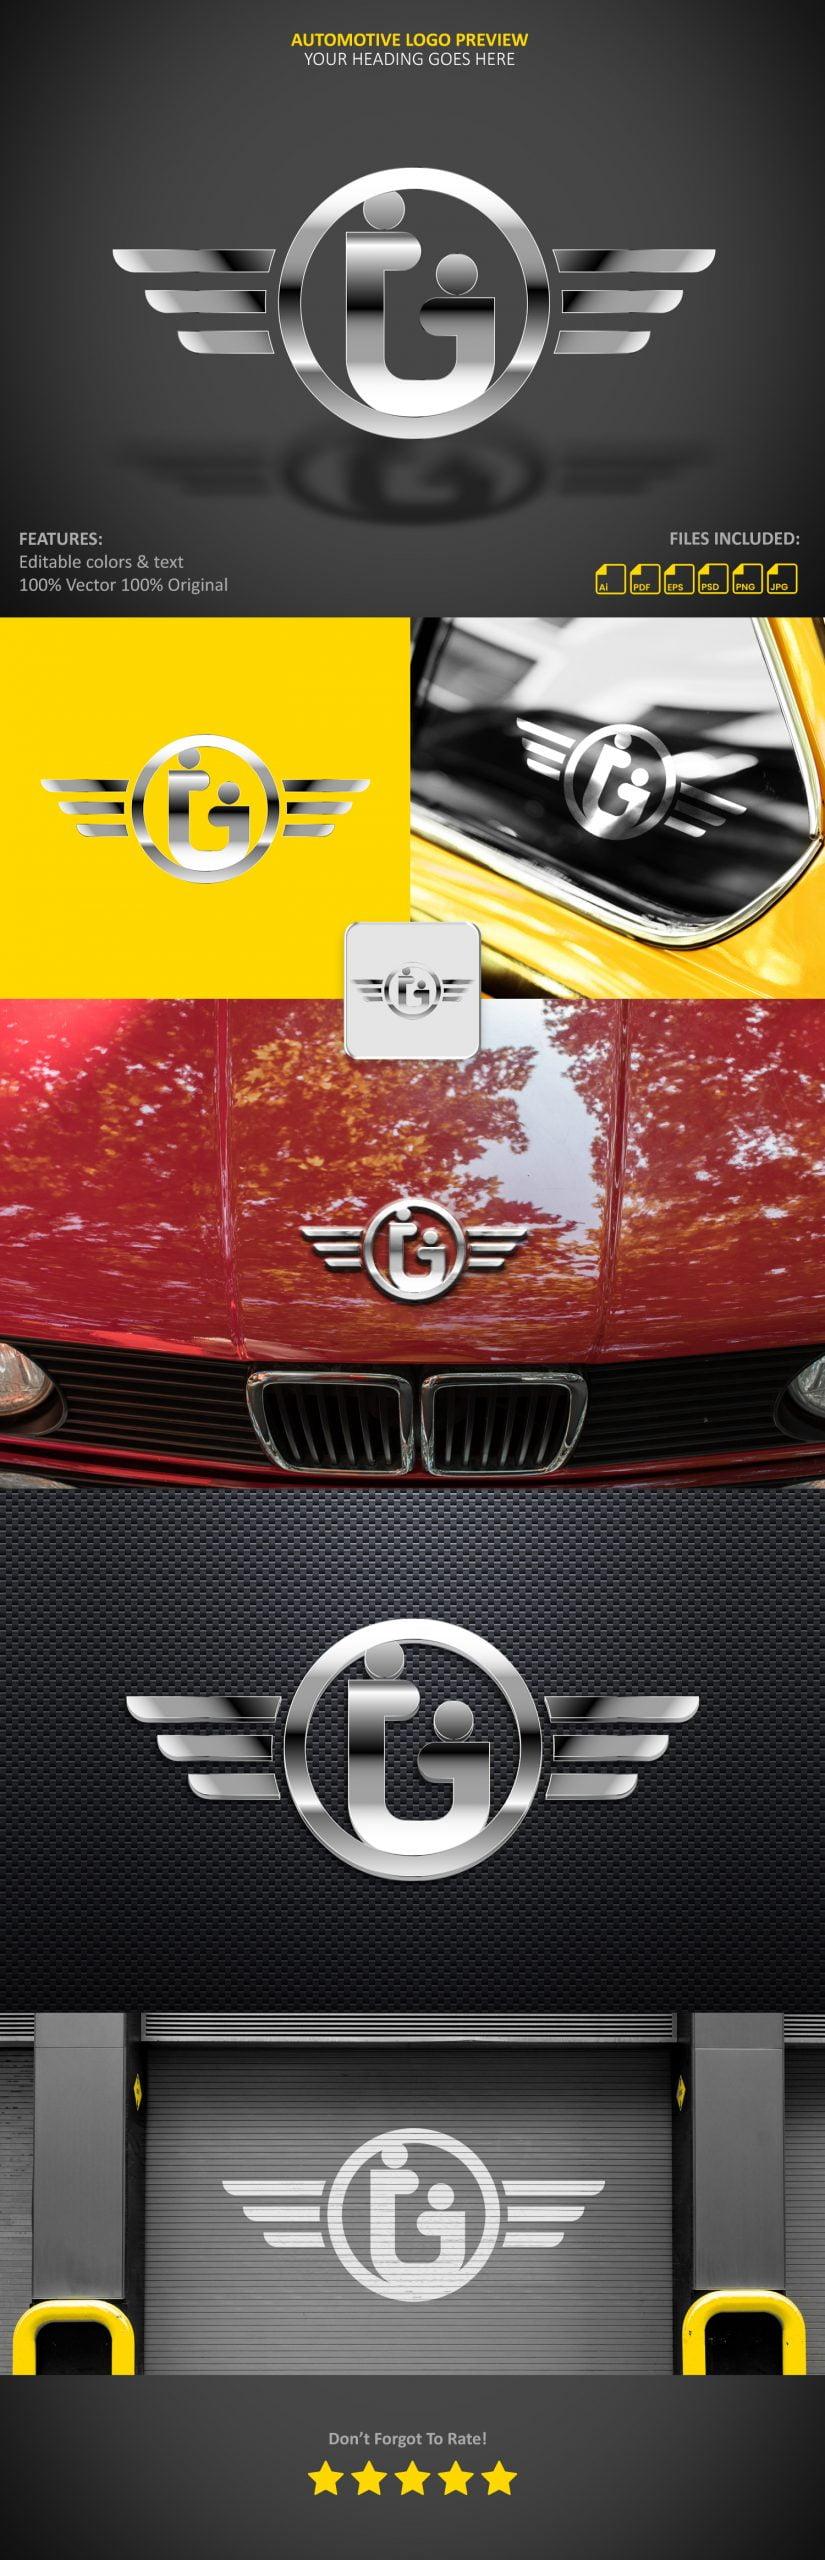 Automotive Logo Presentation Mockup by GraphicsFamily